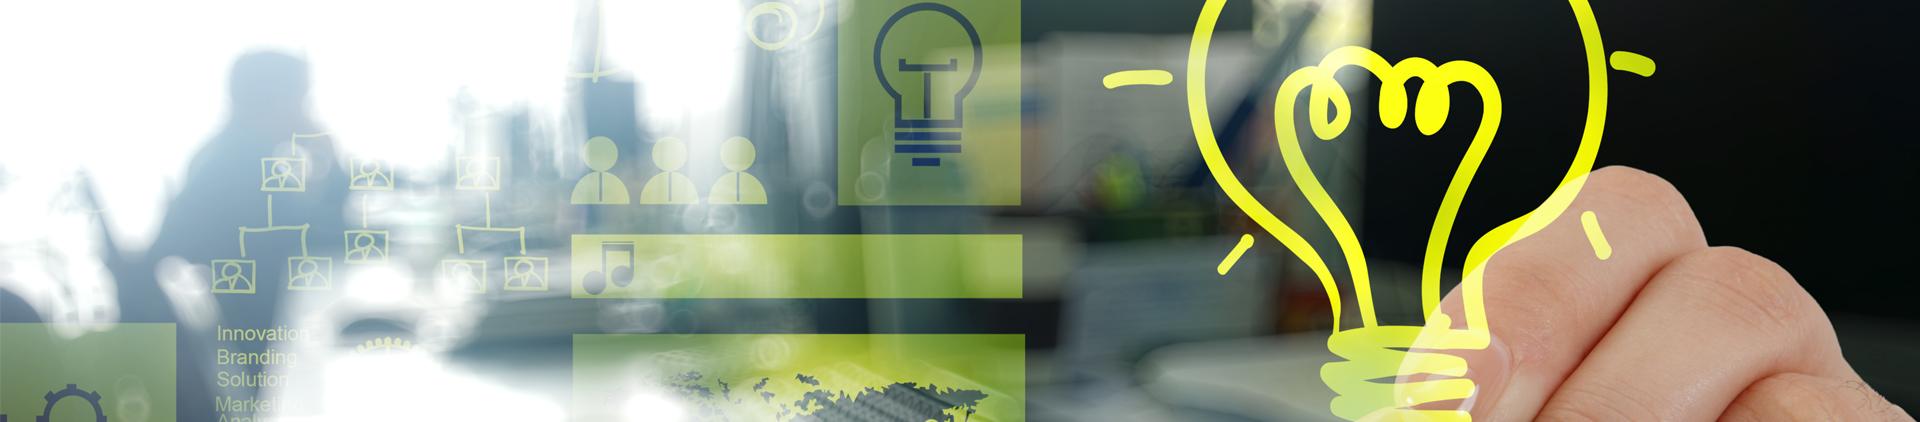 SMEs: Creating Growth through Entrepreneurship and